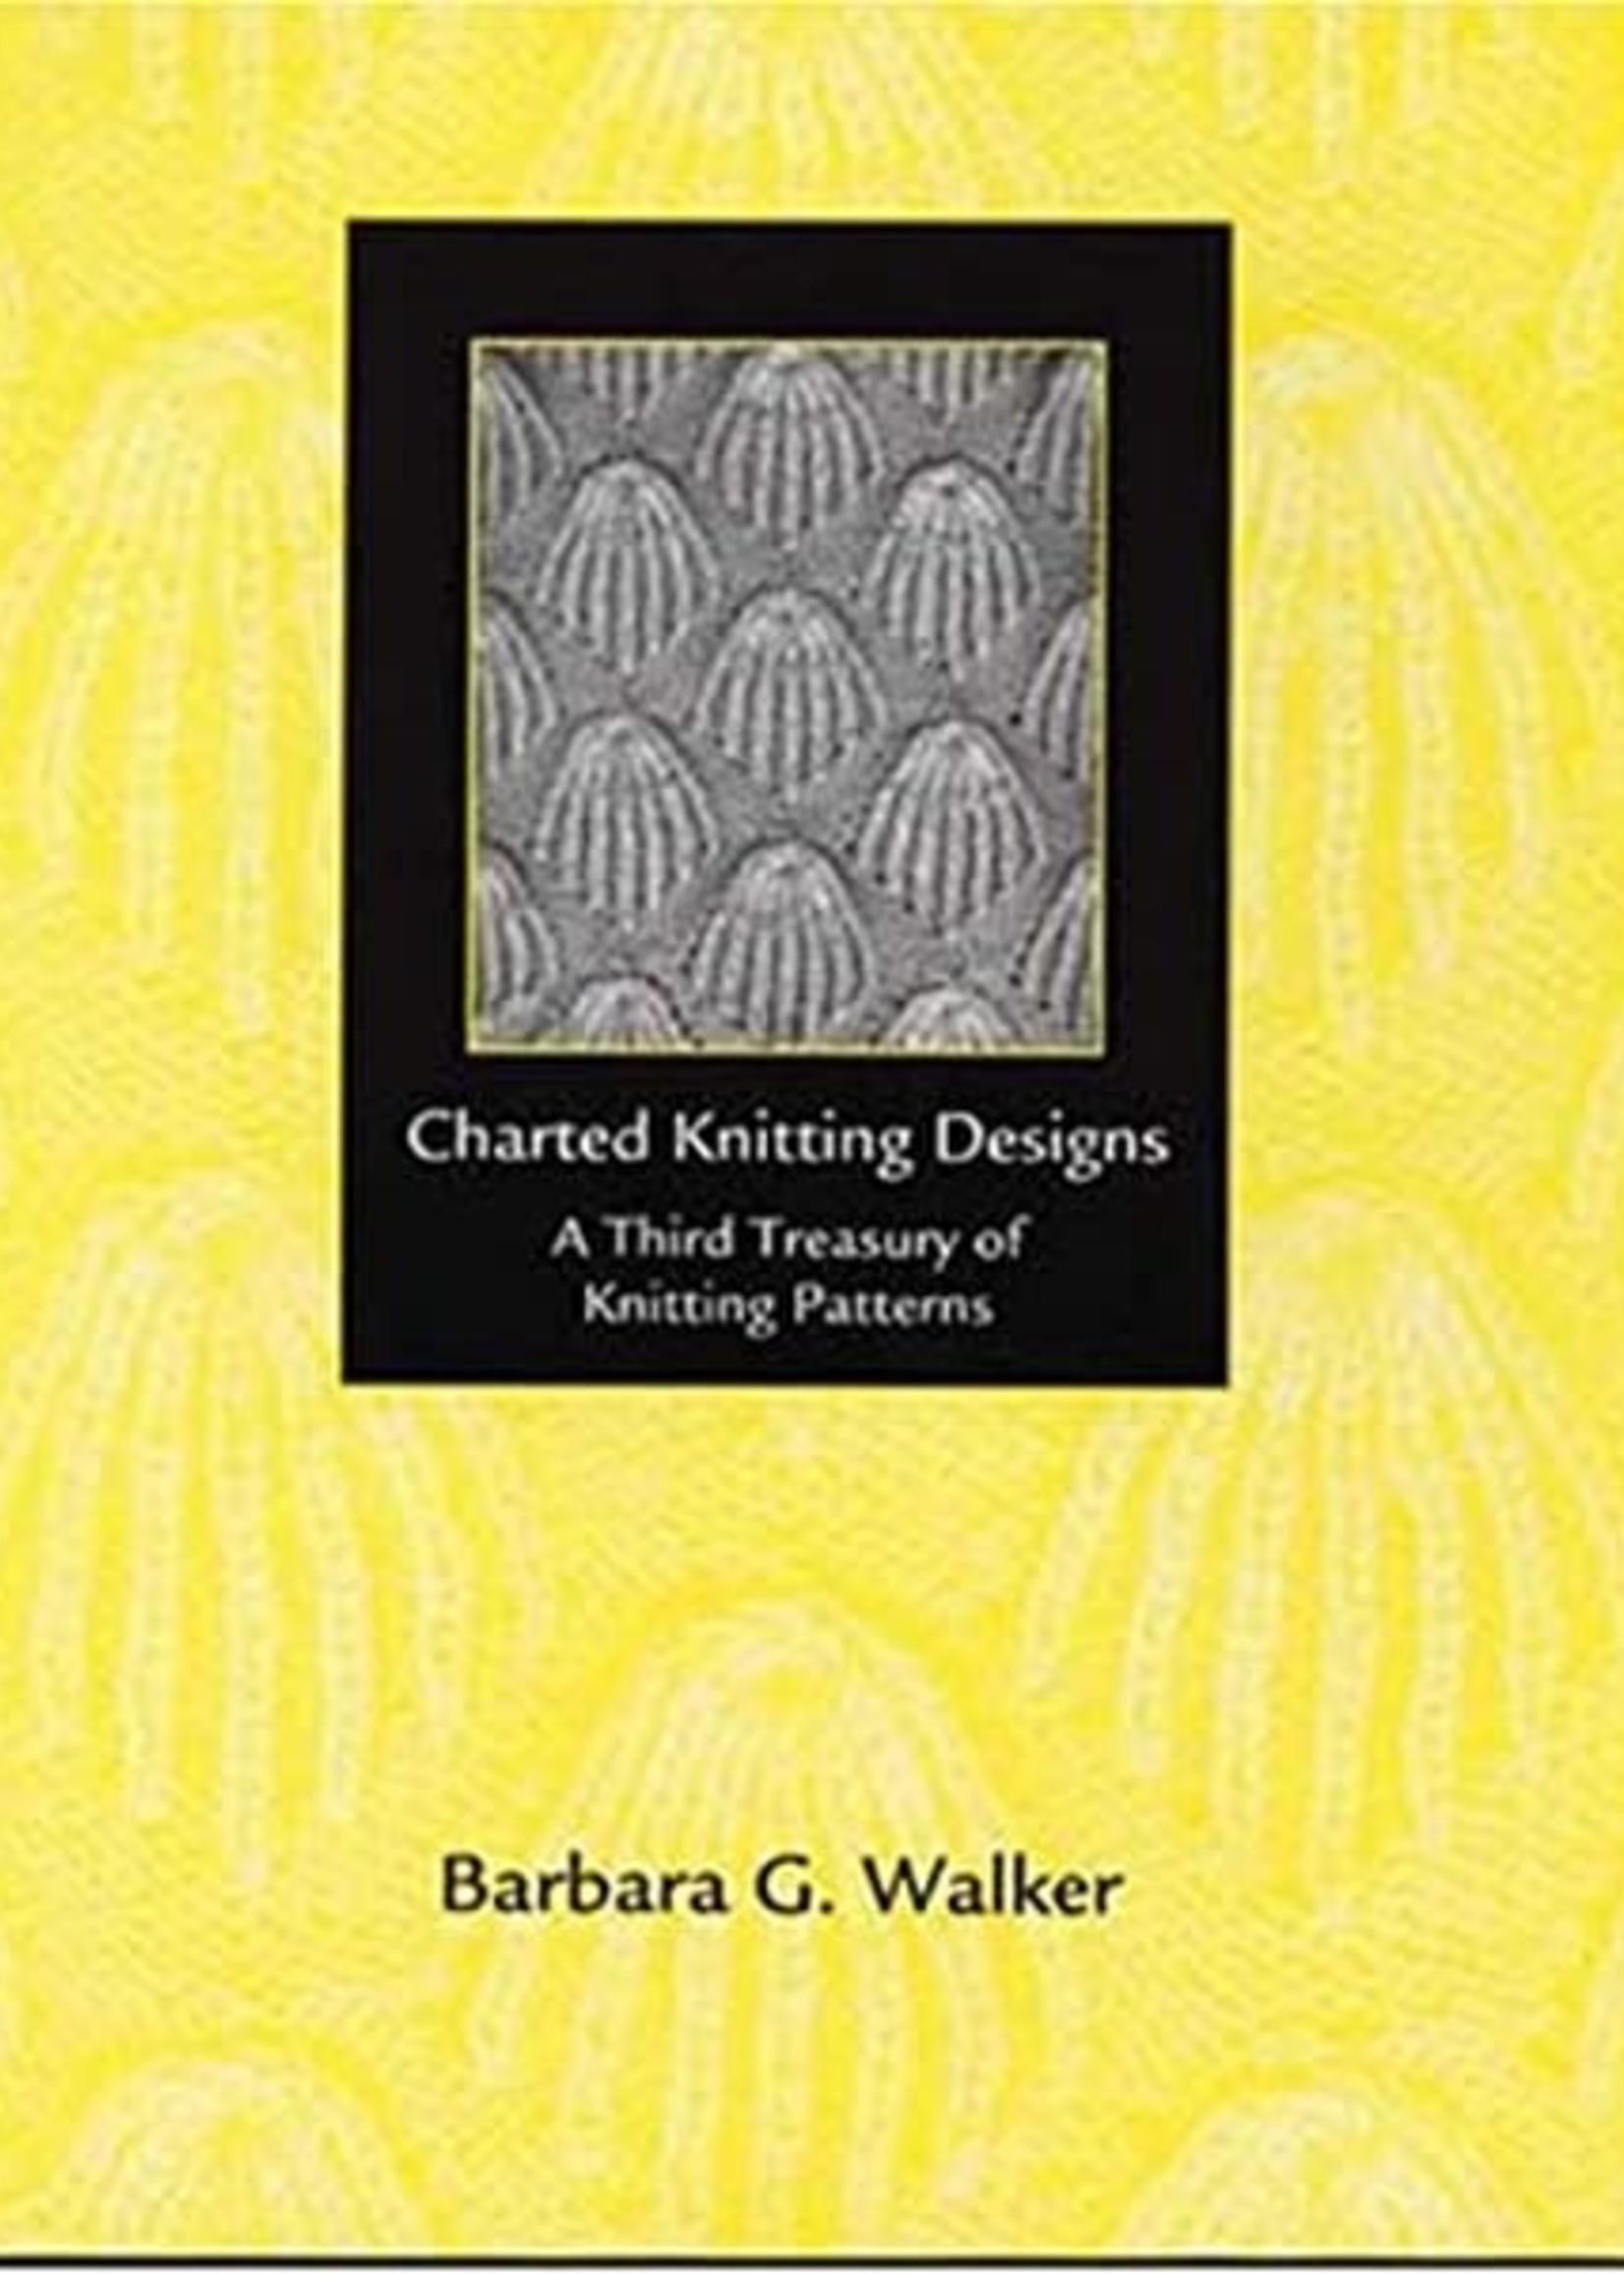 Charted Knitting Designs A Third Treasury B. Walker